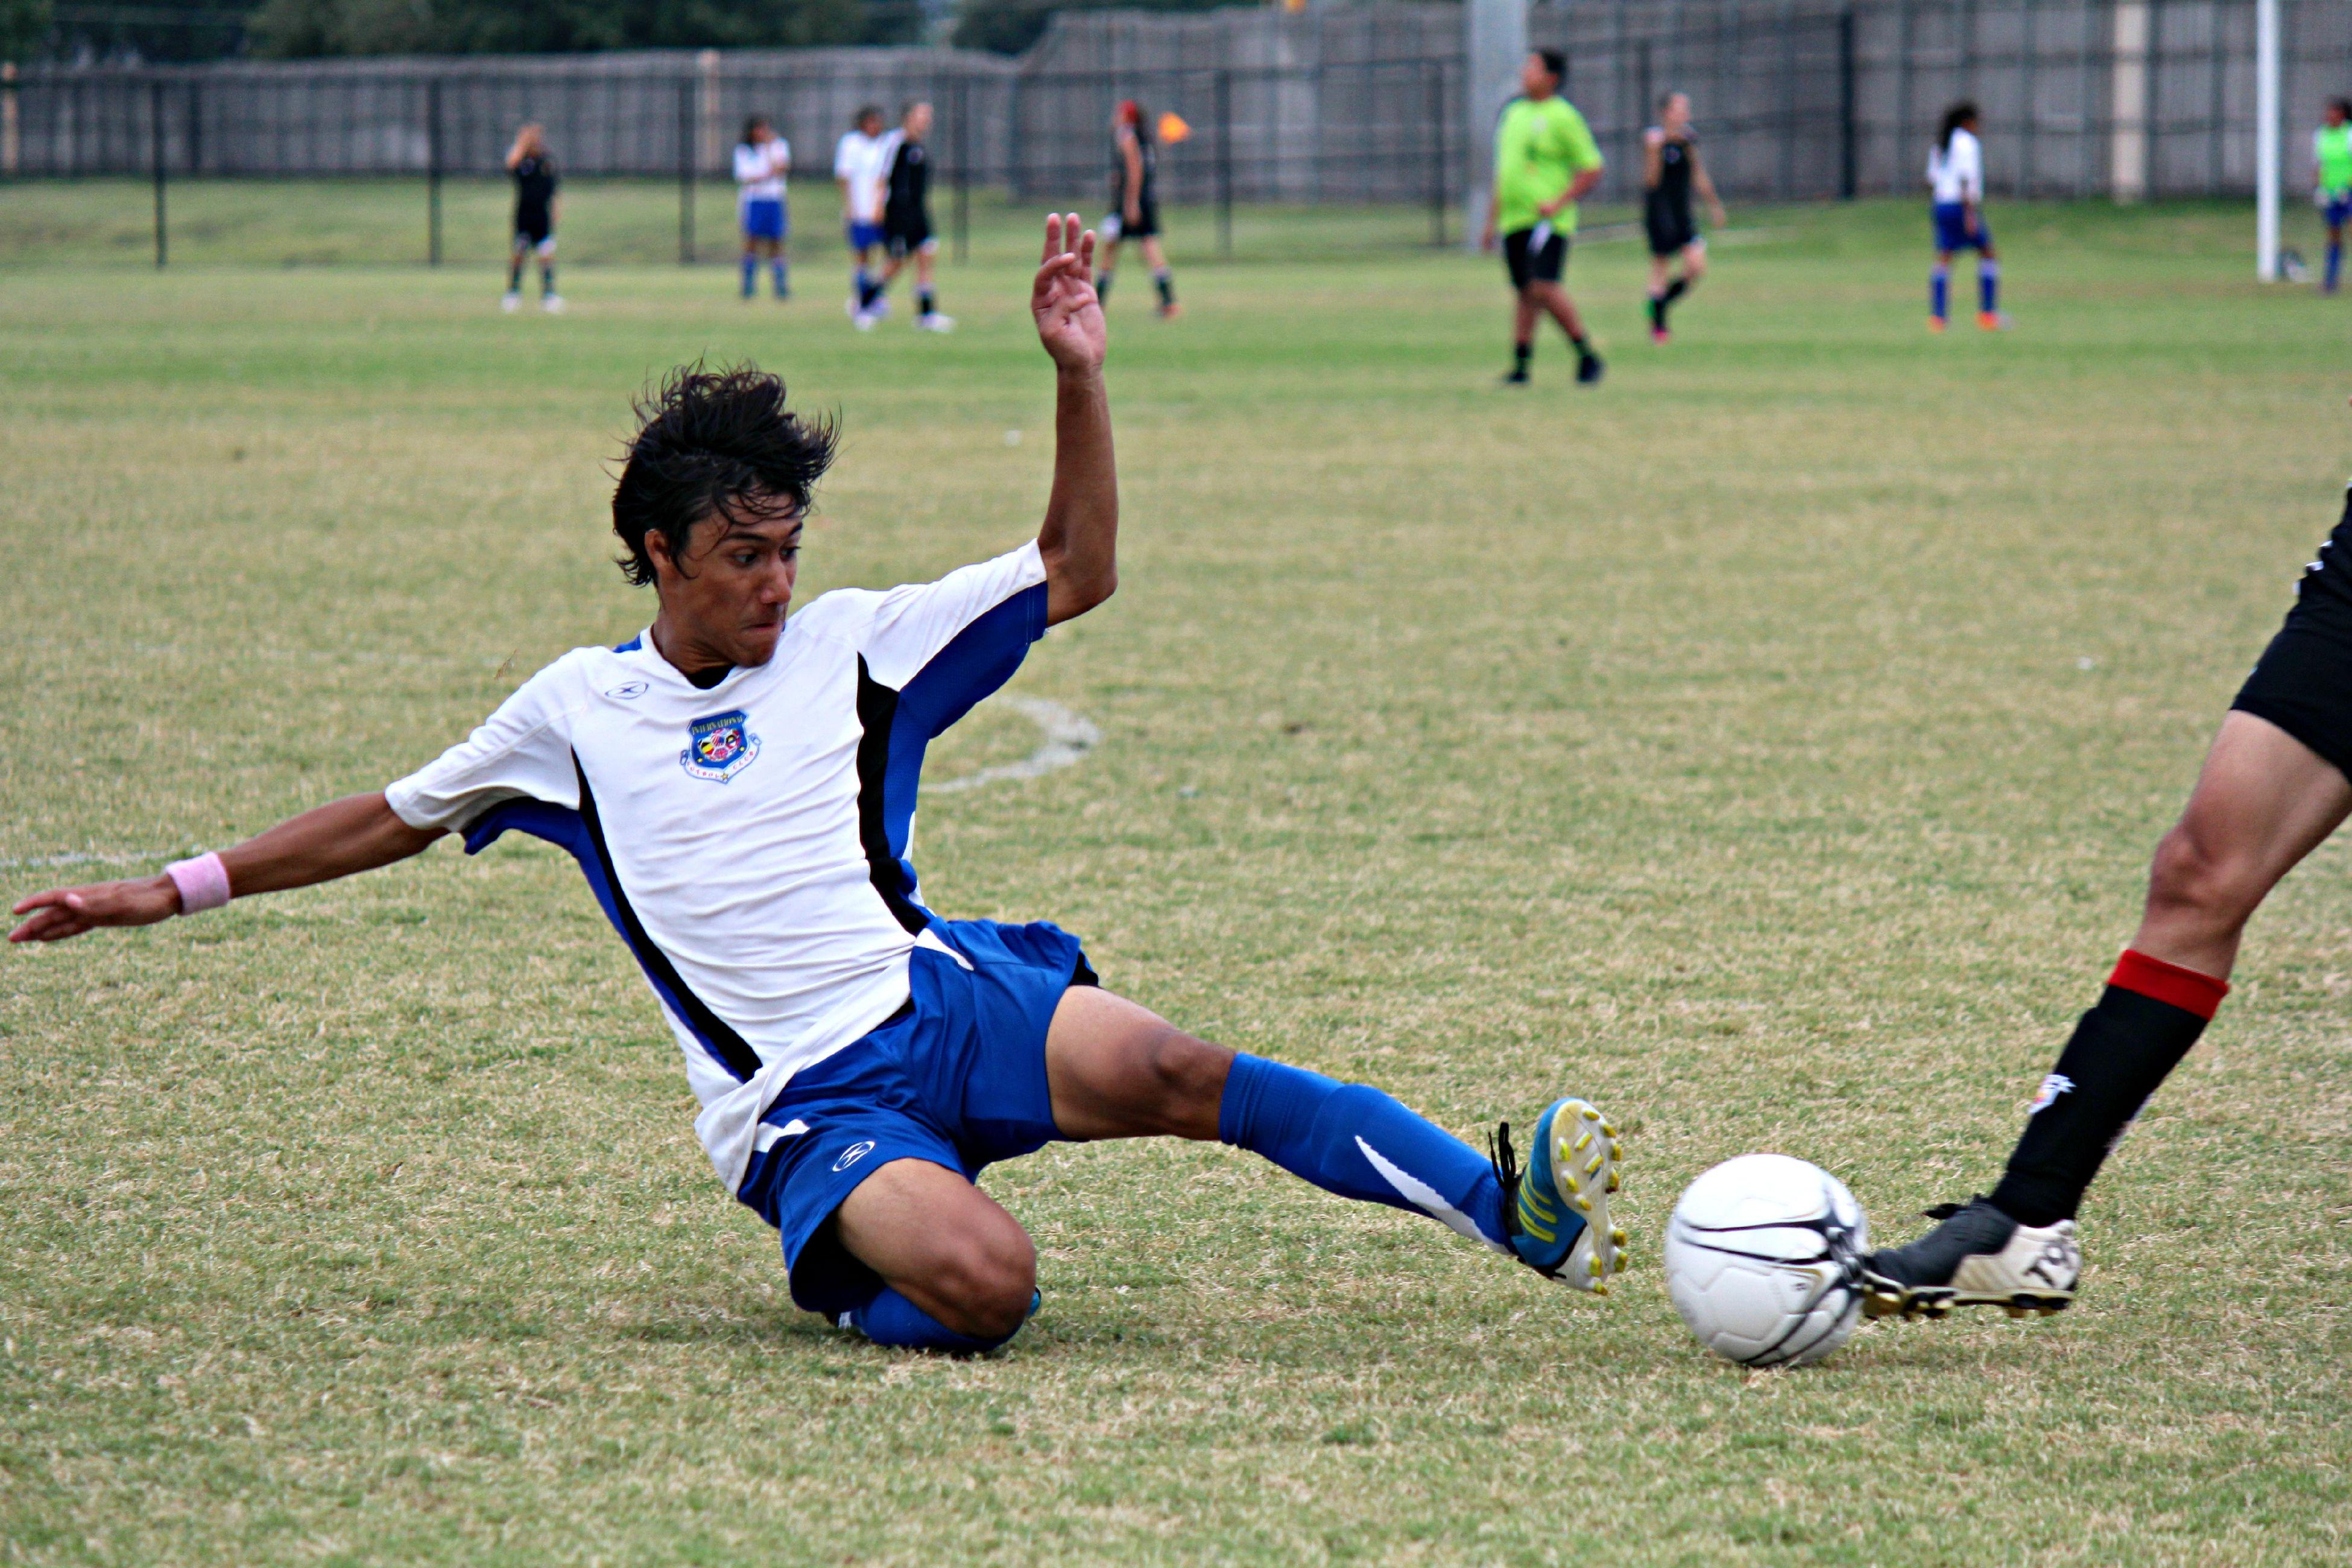 Arlington  Ball Futbol Mens Soccer Photography In Motion Select Soccer Slide Tackle Soccer Texas